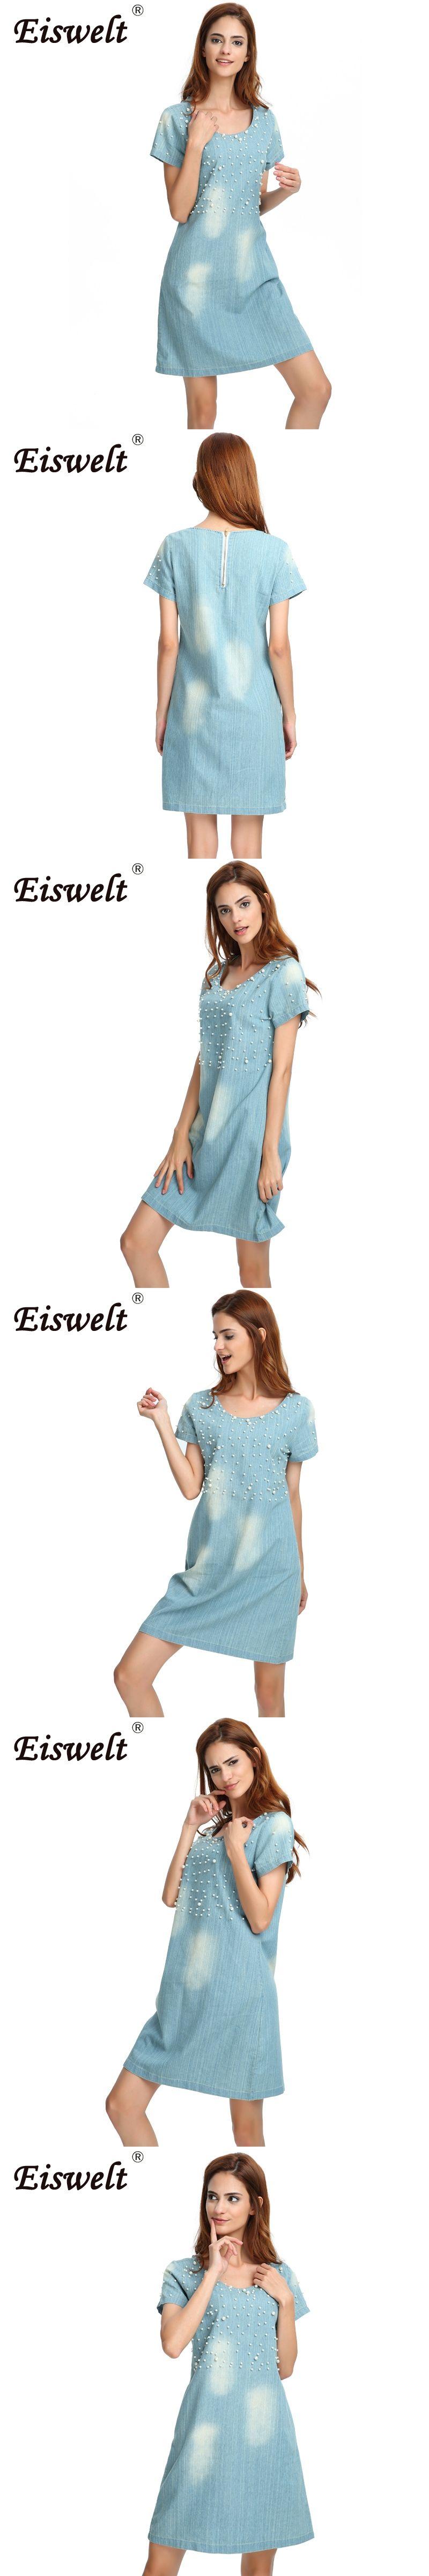 EISWELT Plus Size 5XL Dress Women Jeans Sundress Women\'s Casual ...